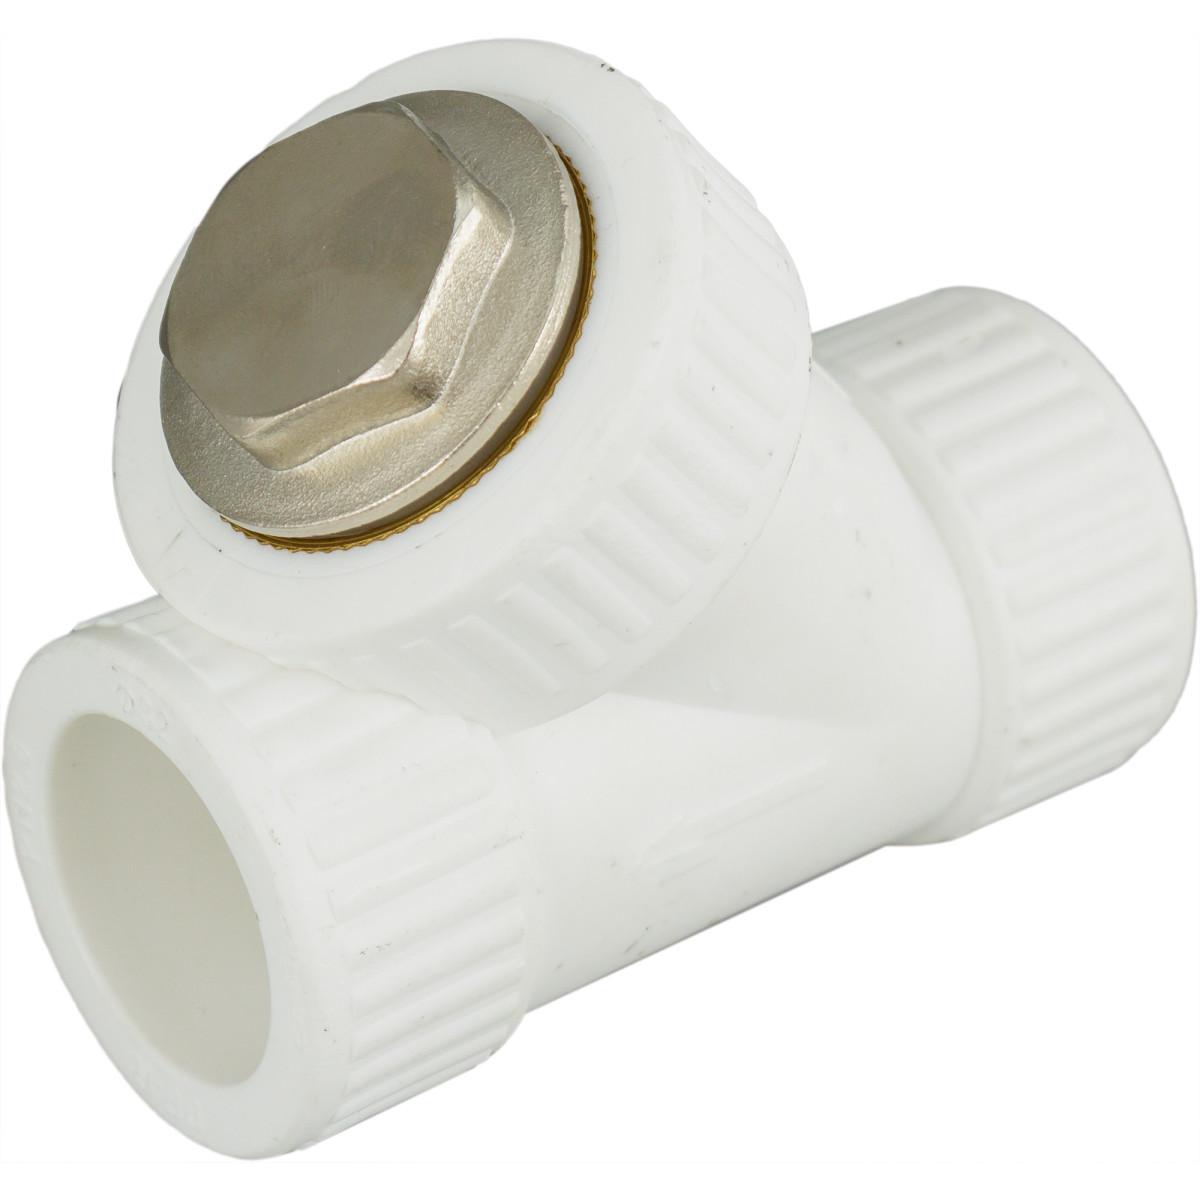 Фильтр косой внутренняя-внутренняя резьба 32 мм полипропилен